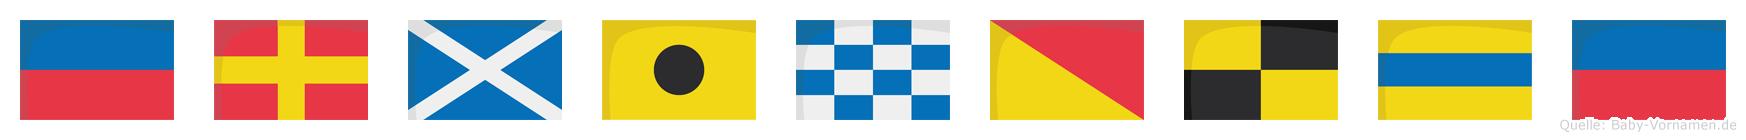 Erminolde im Flaggenalphabet